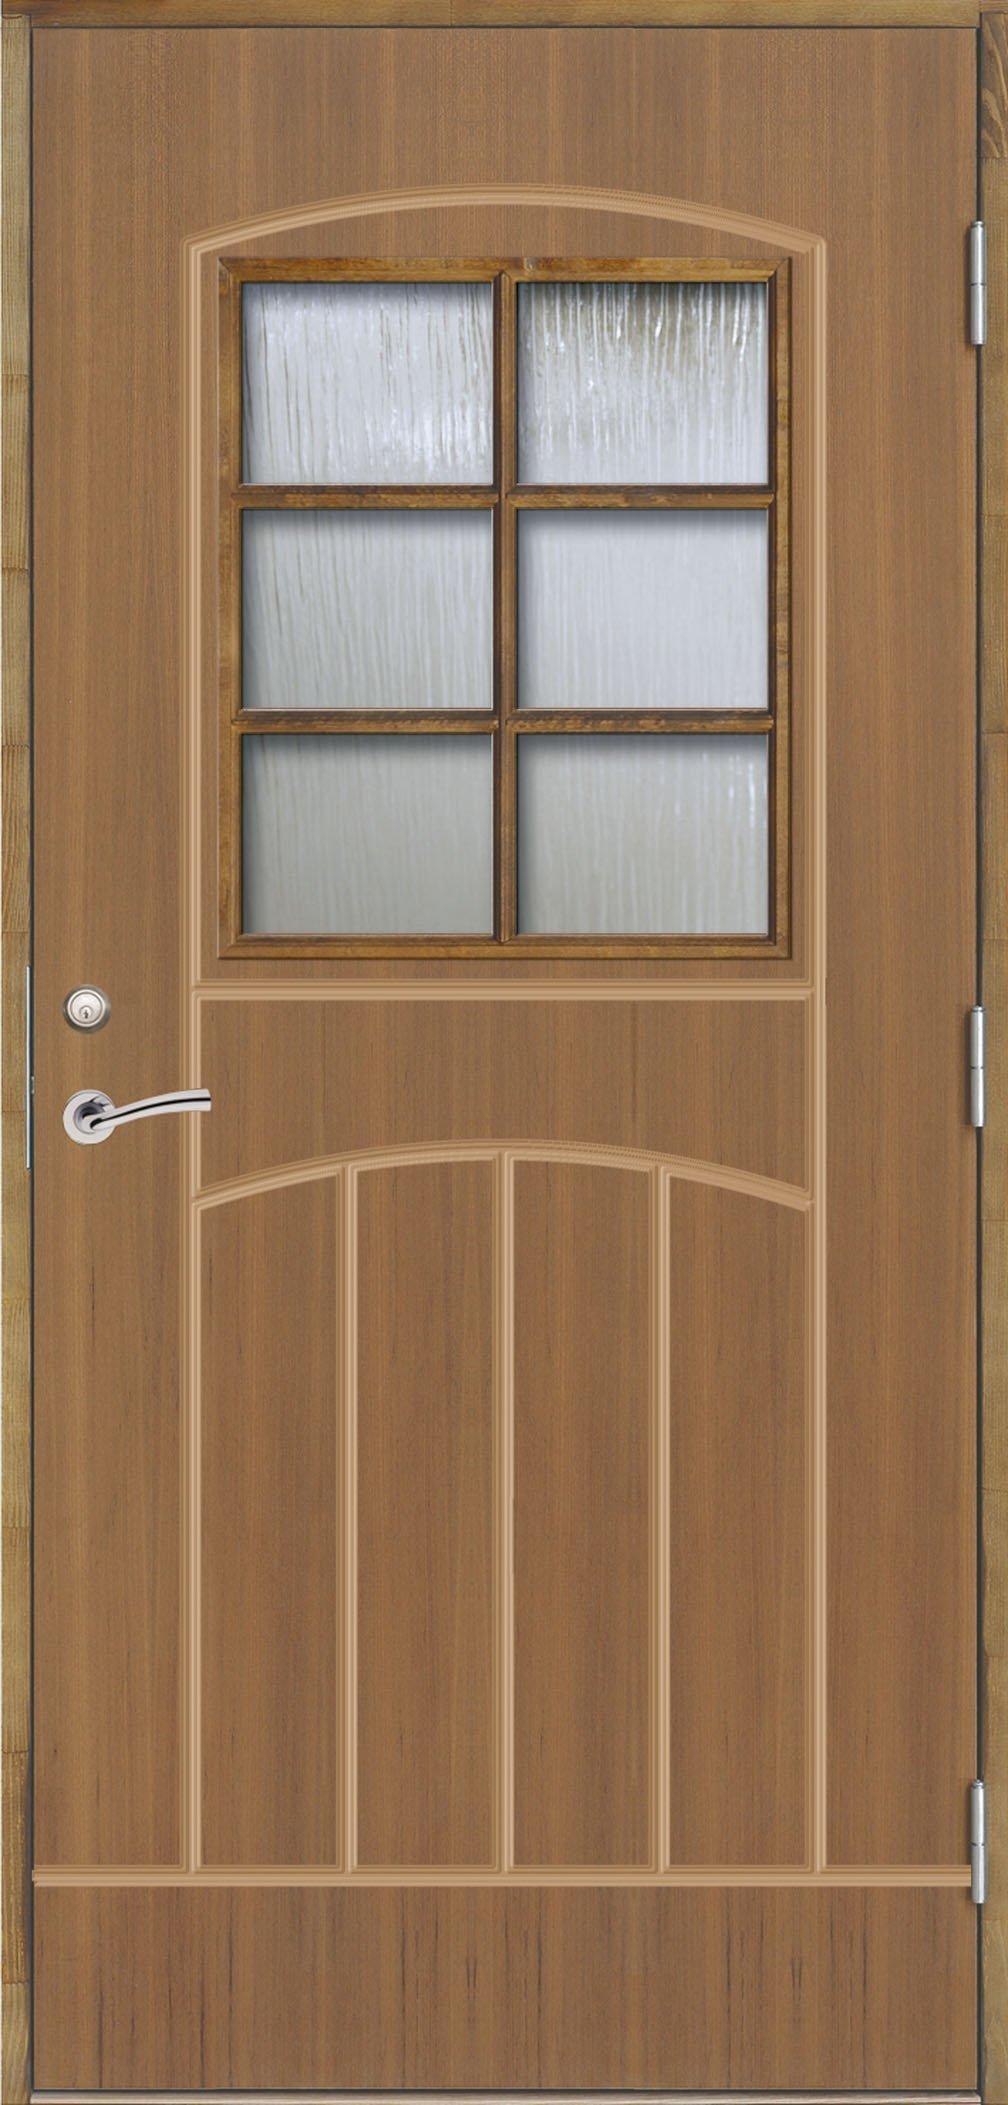 viljandi aken ja uks salong tallinnas välisuksed